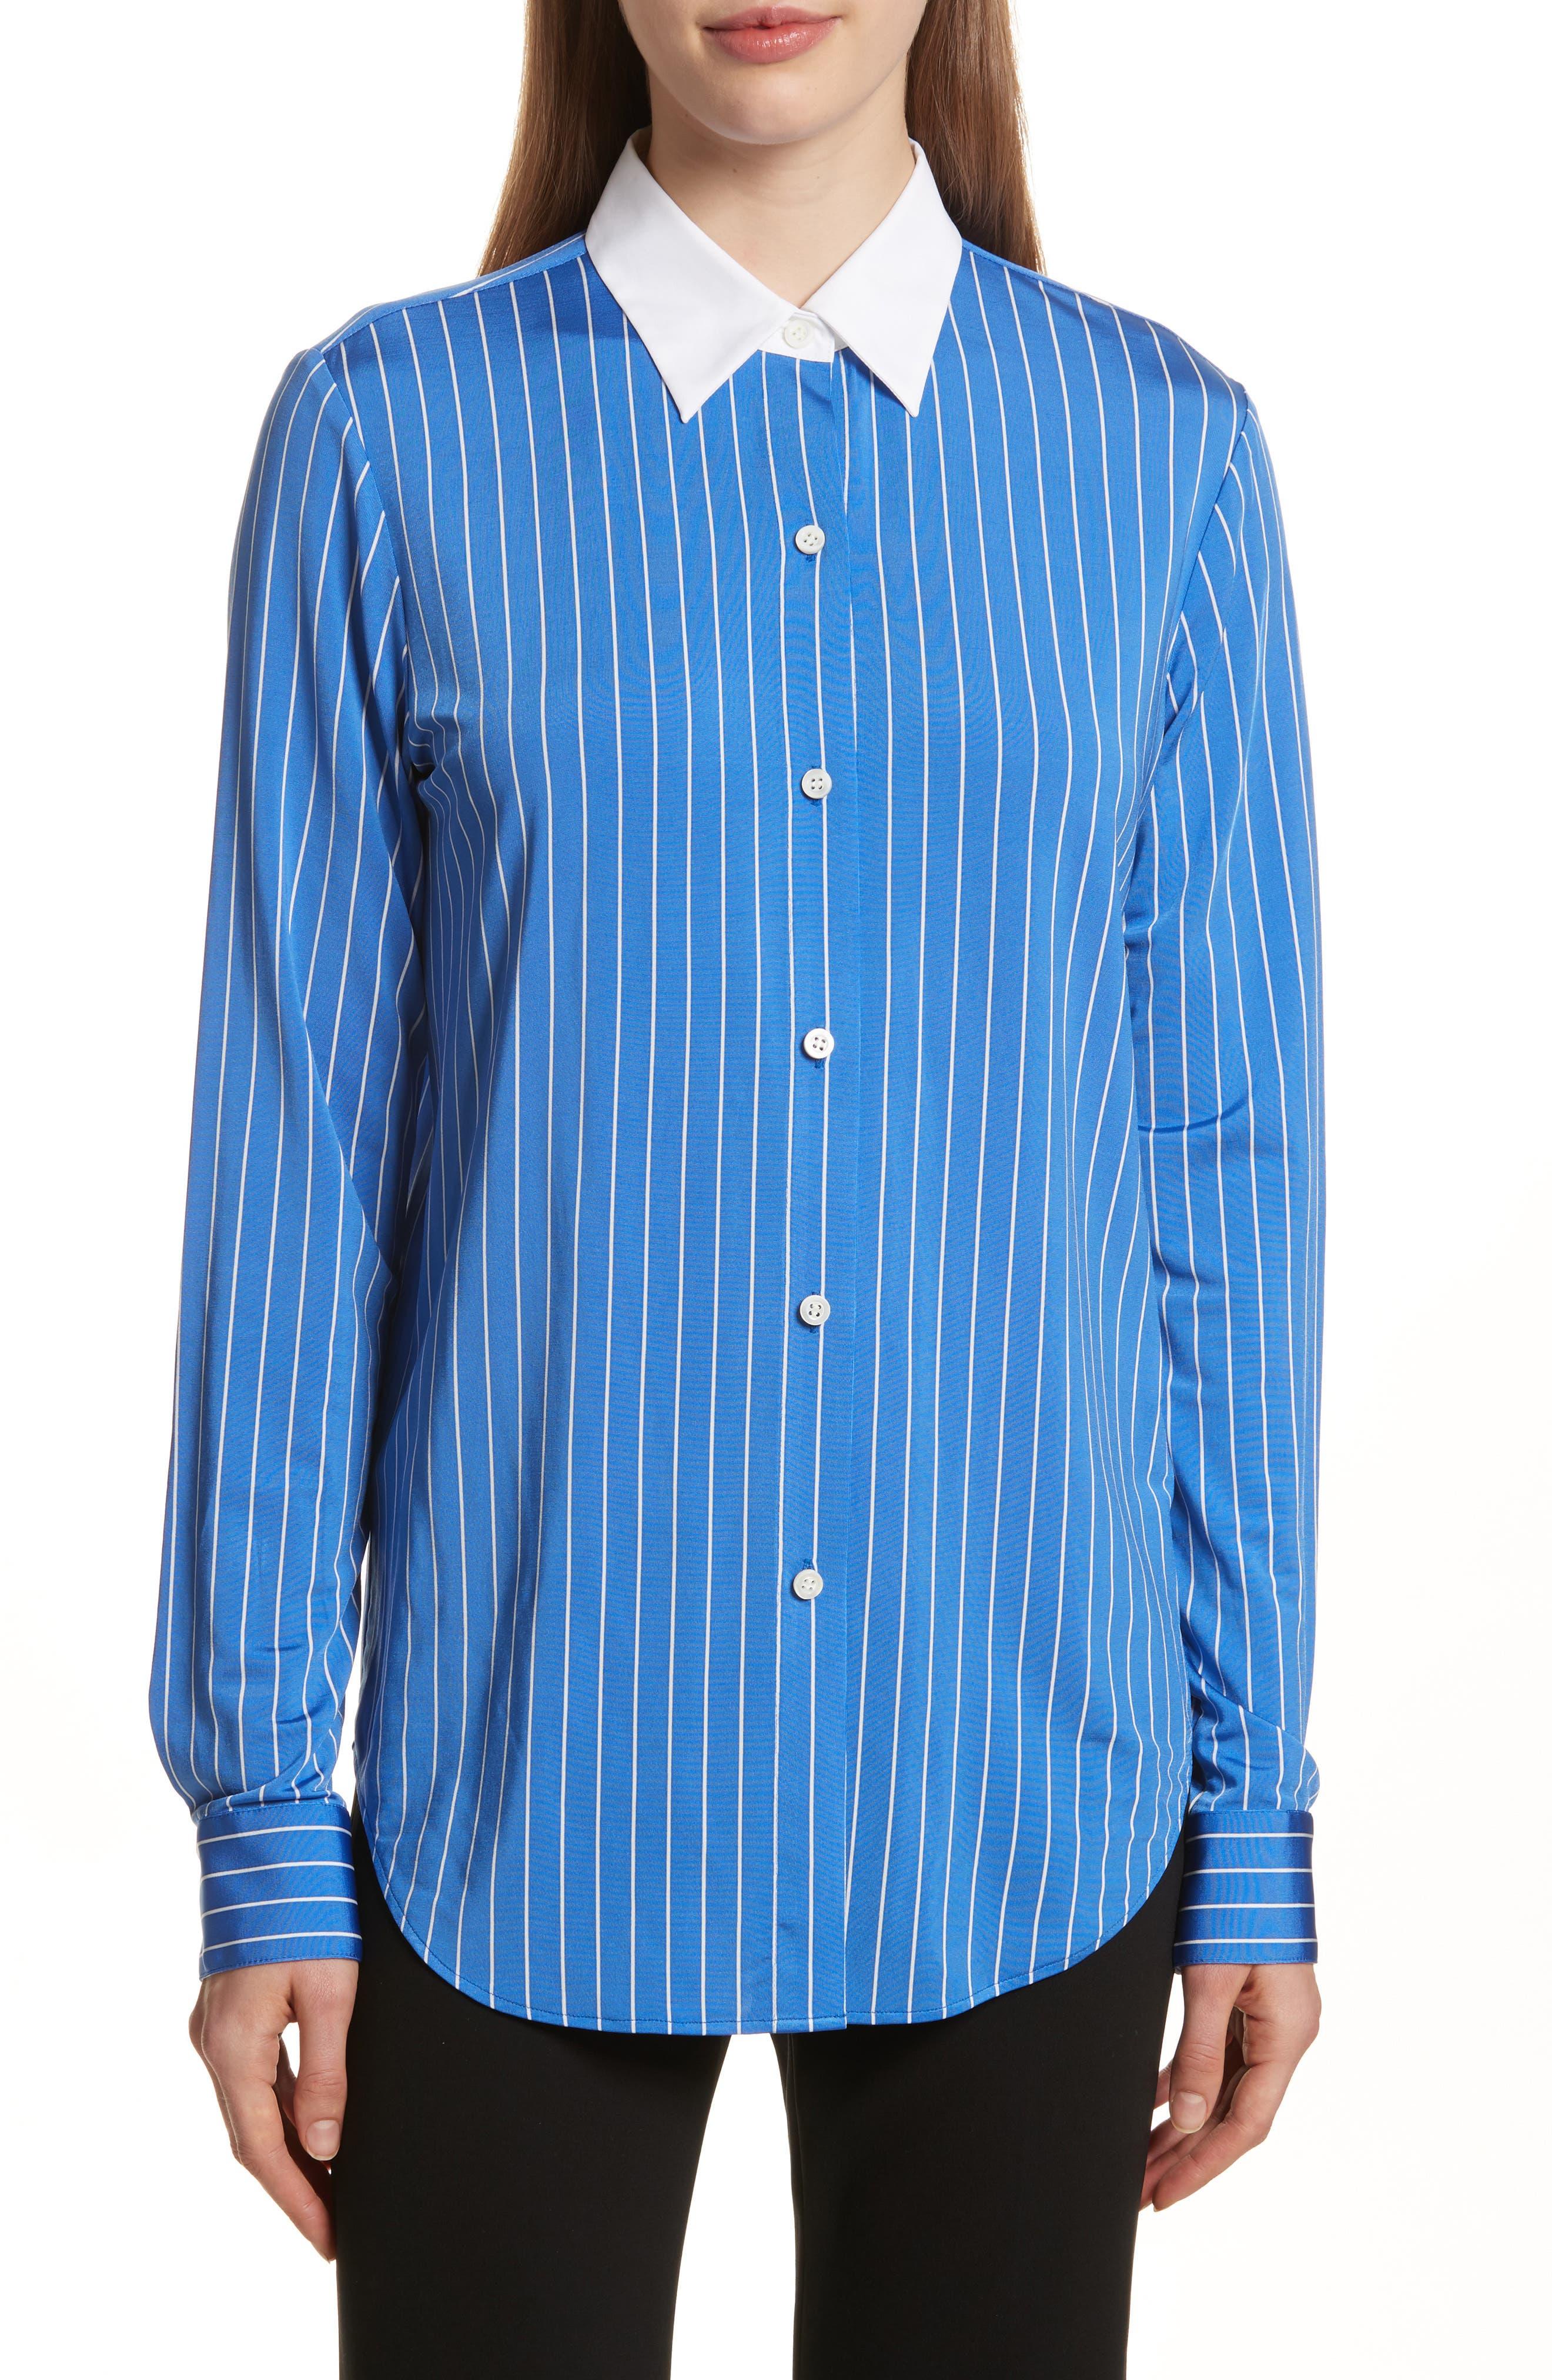 Essential Stripe Jersey Button Down Shirt,                             Main thumbnail 1, color,                             Blue/ White